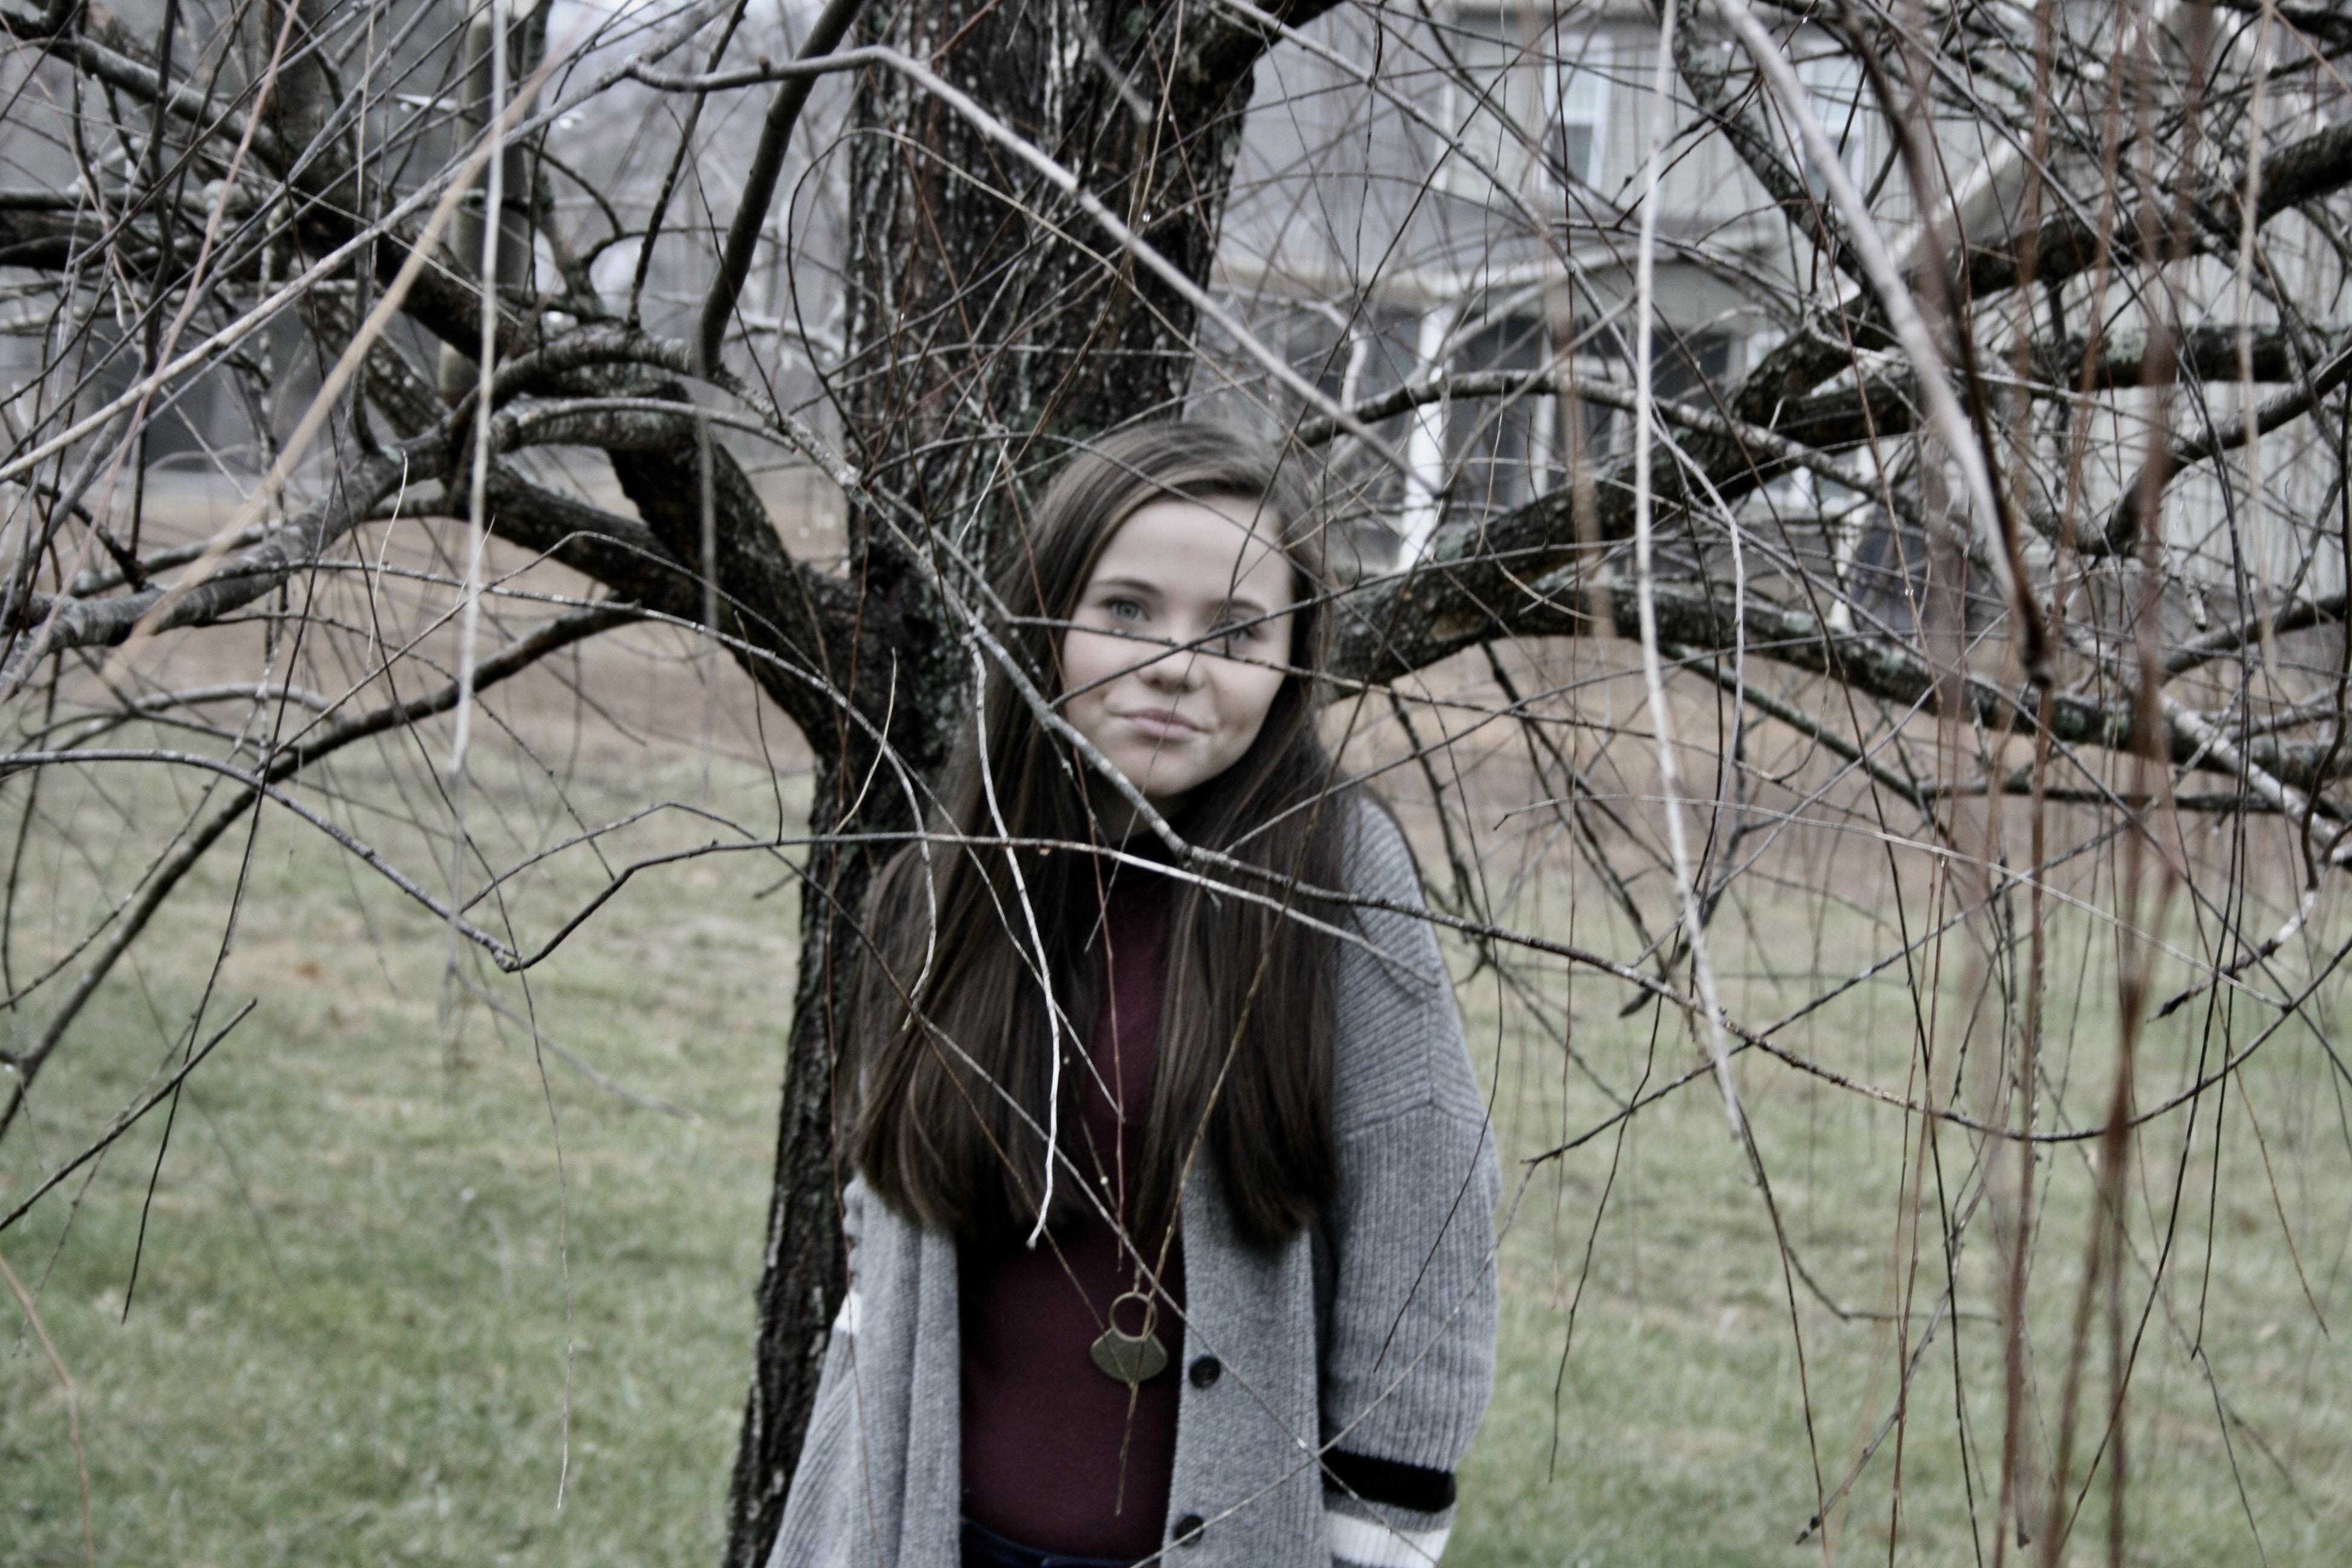 Free Unsplash photo from Mary  Gattis